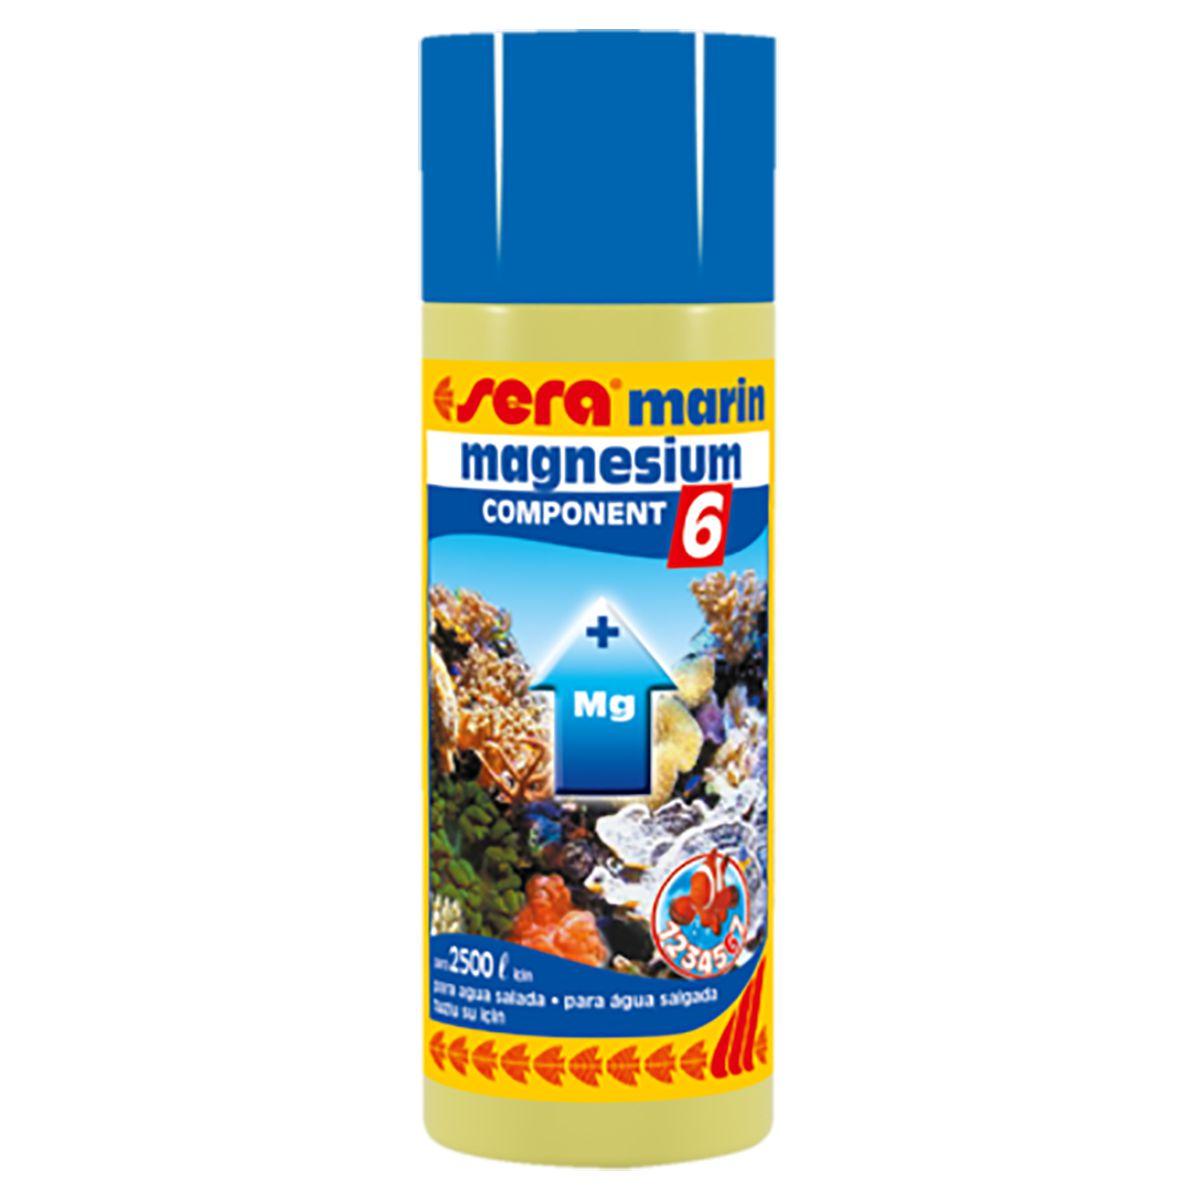 SERA MARIN COMPONENT 6 MAGNESIUM - 250ML